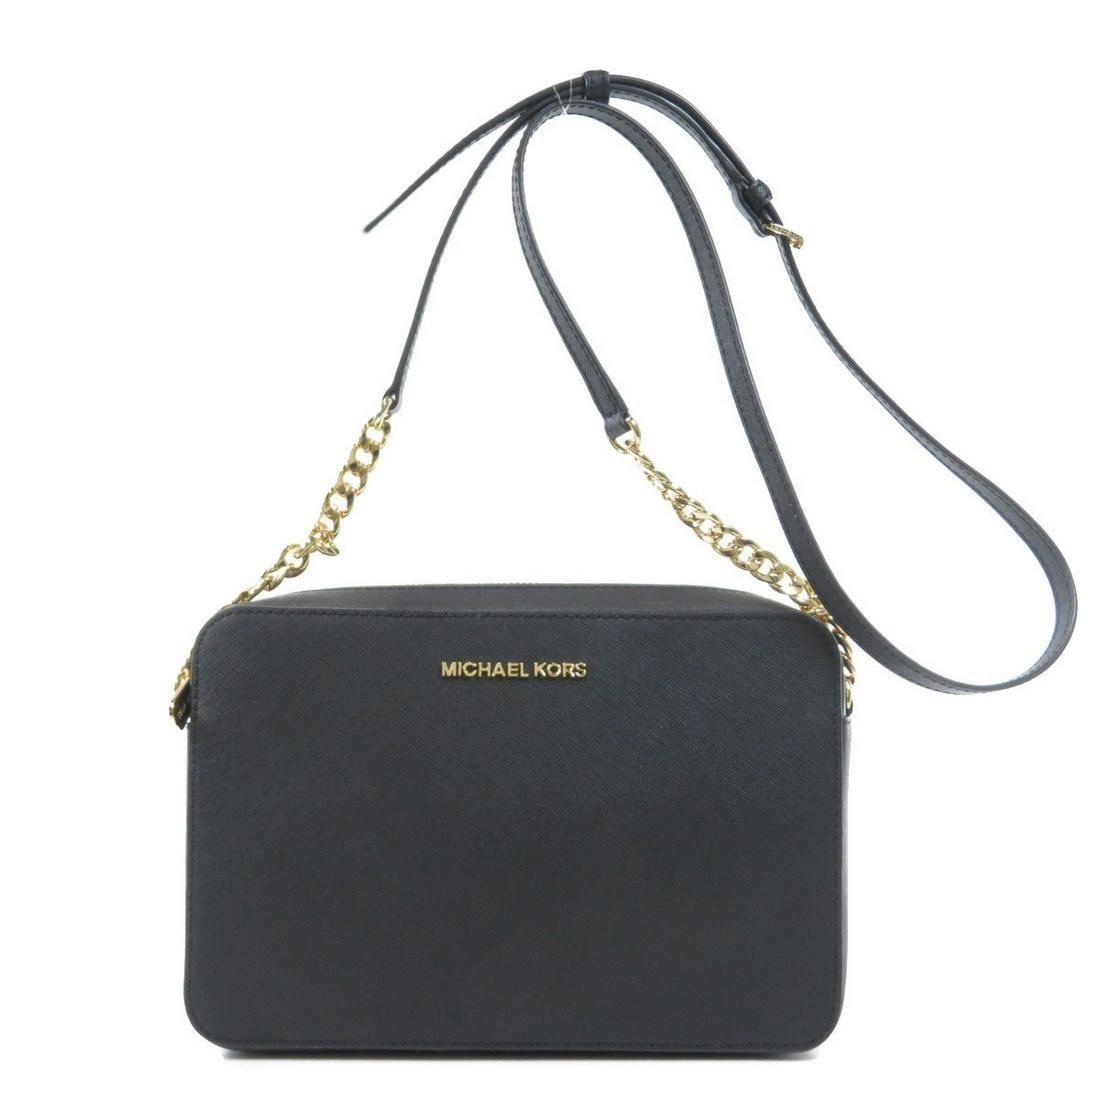 Authentic Michael Kors Logotype Shoulder Bag Leather